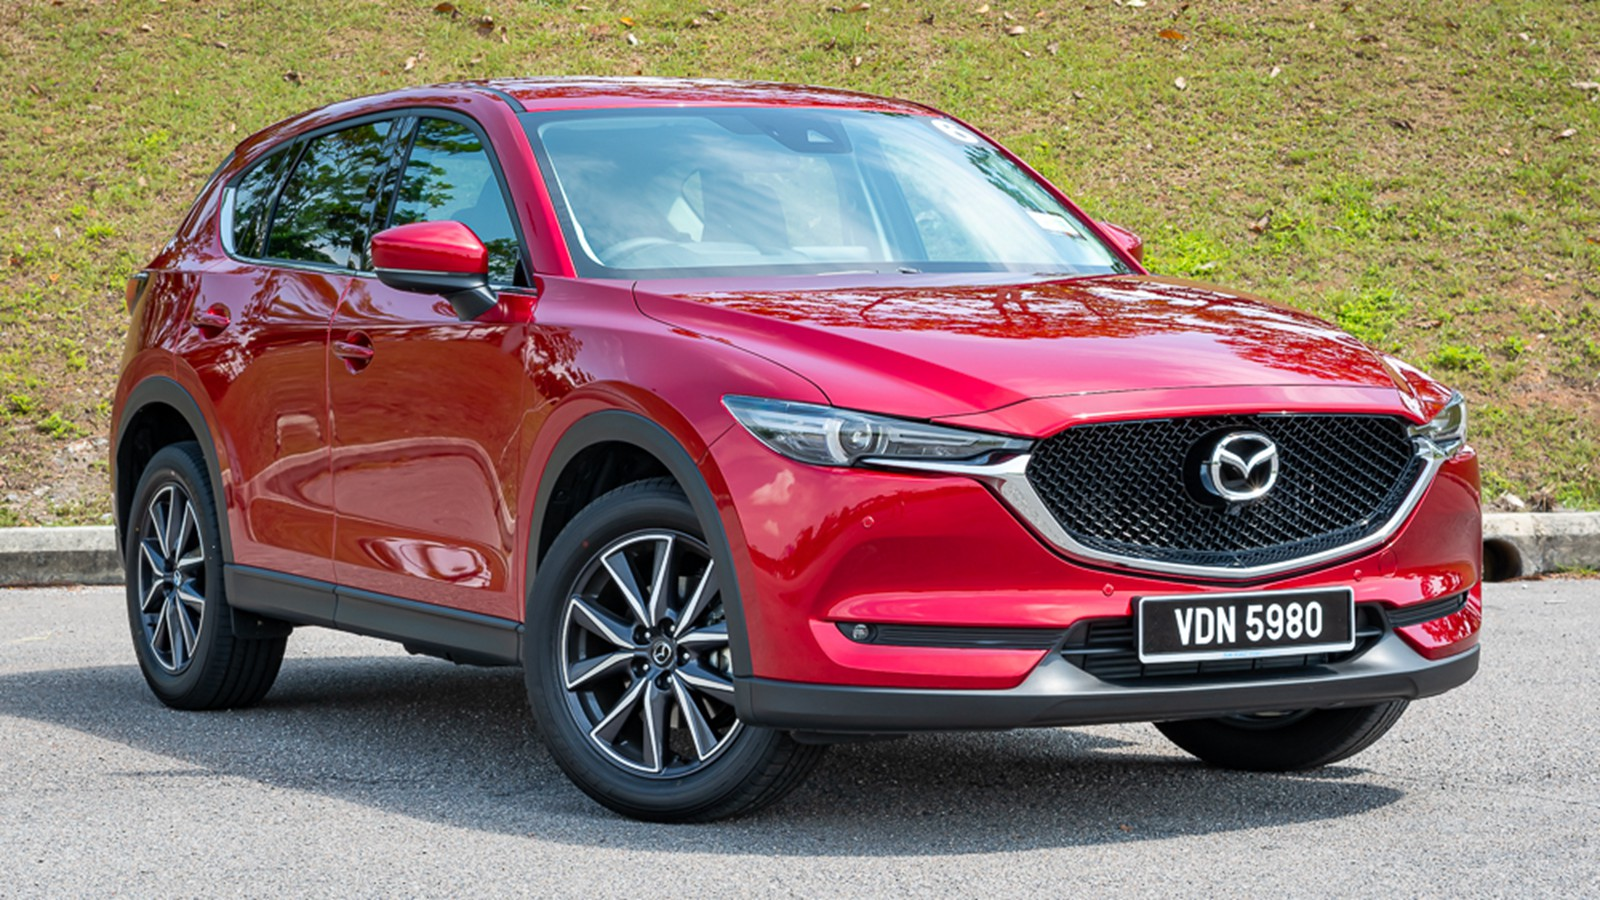 Kelebihan Kekurangan Harga Mazda Cx 5 Murah Berkualitas